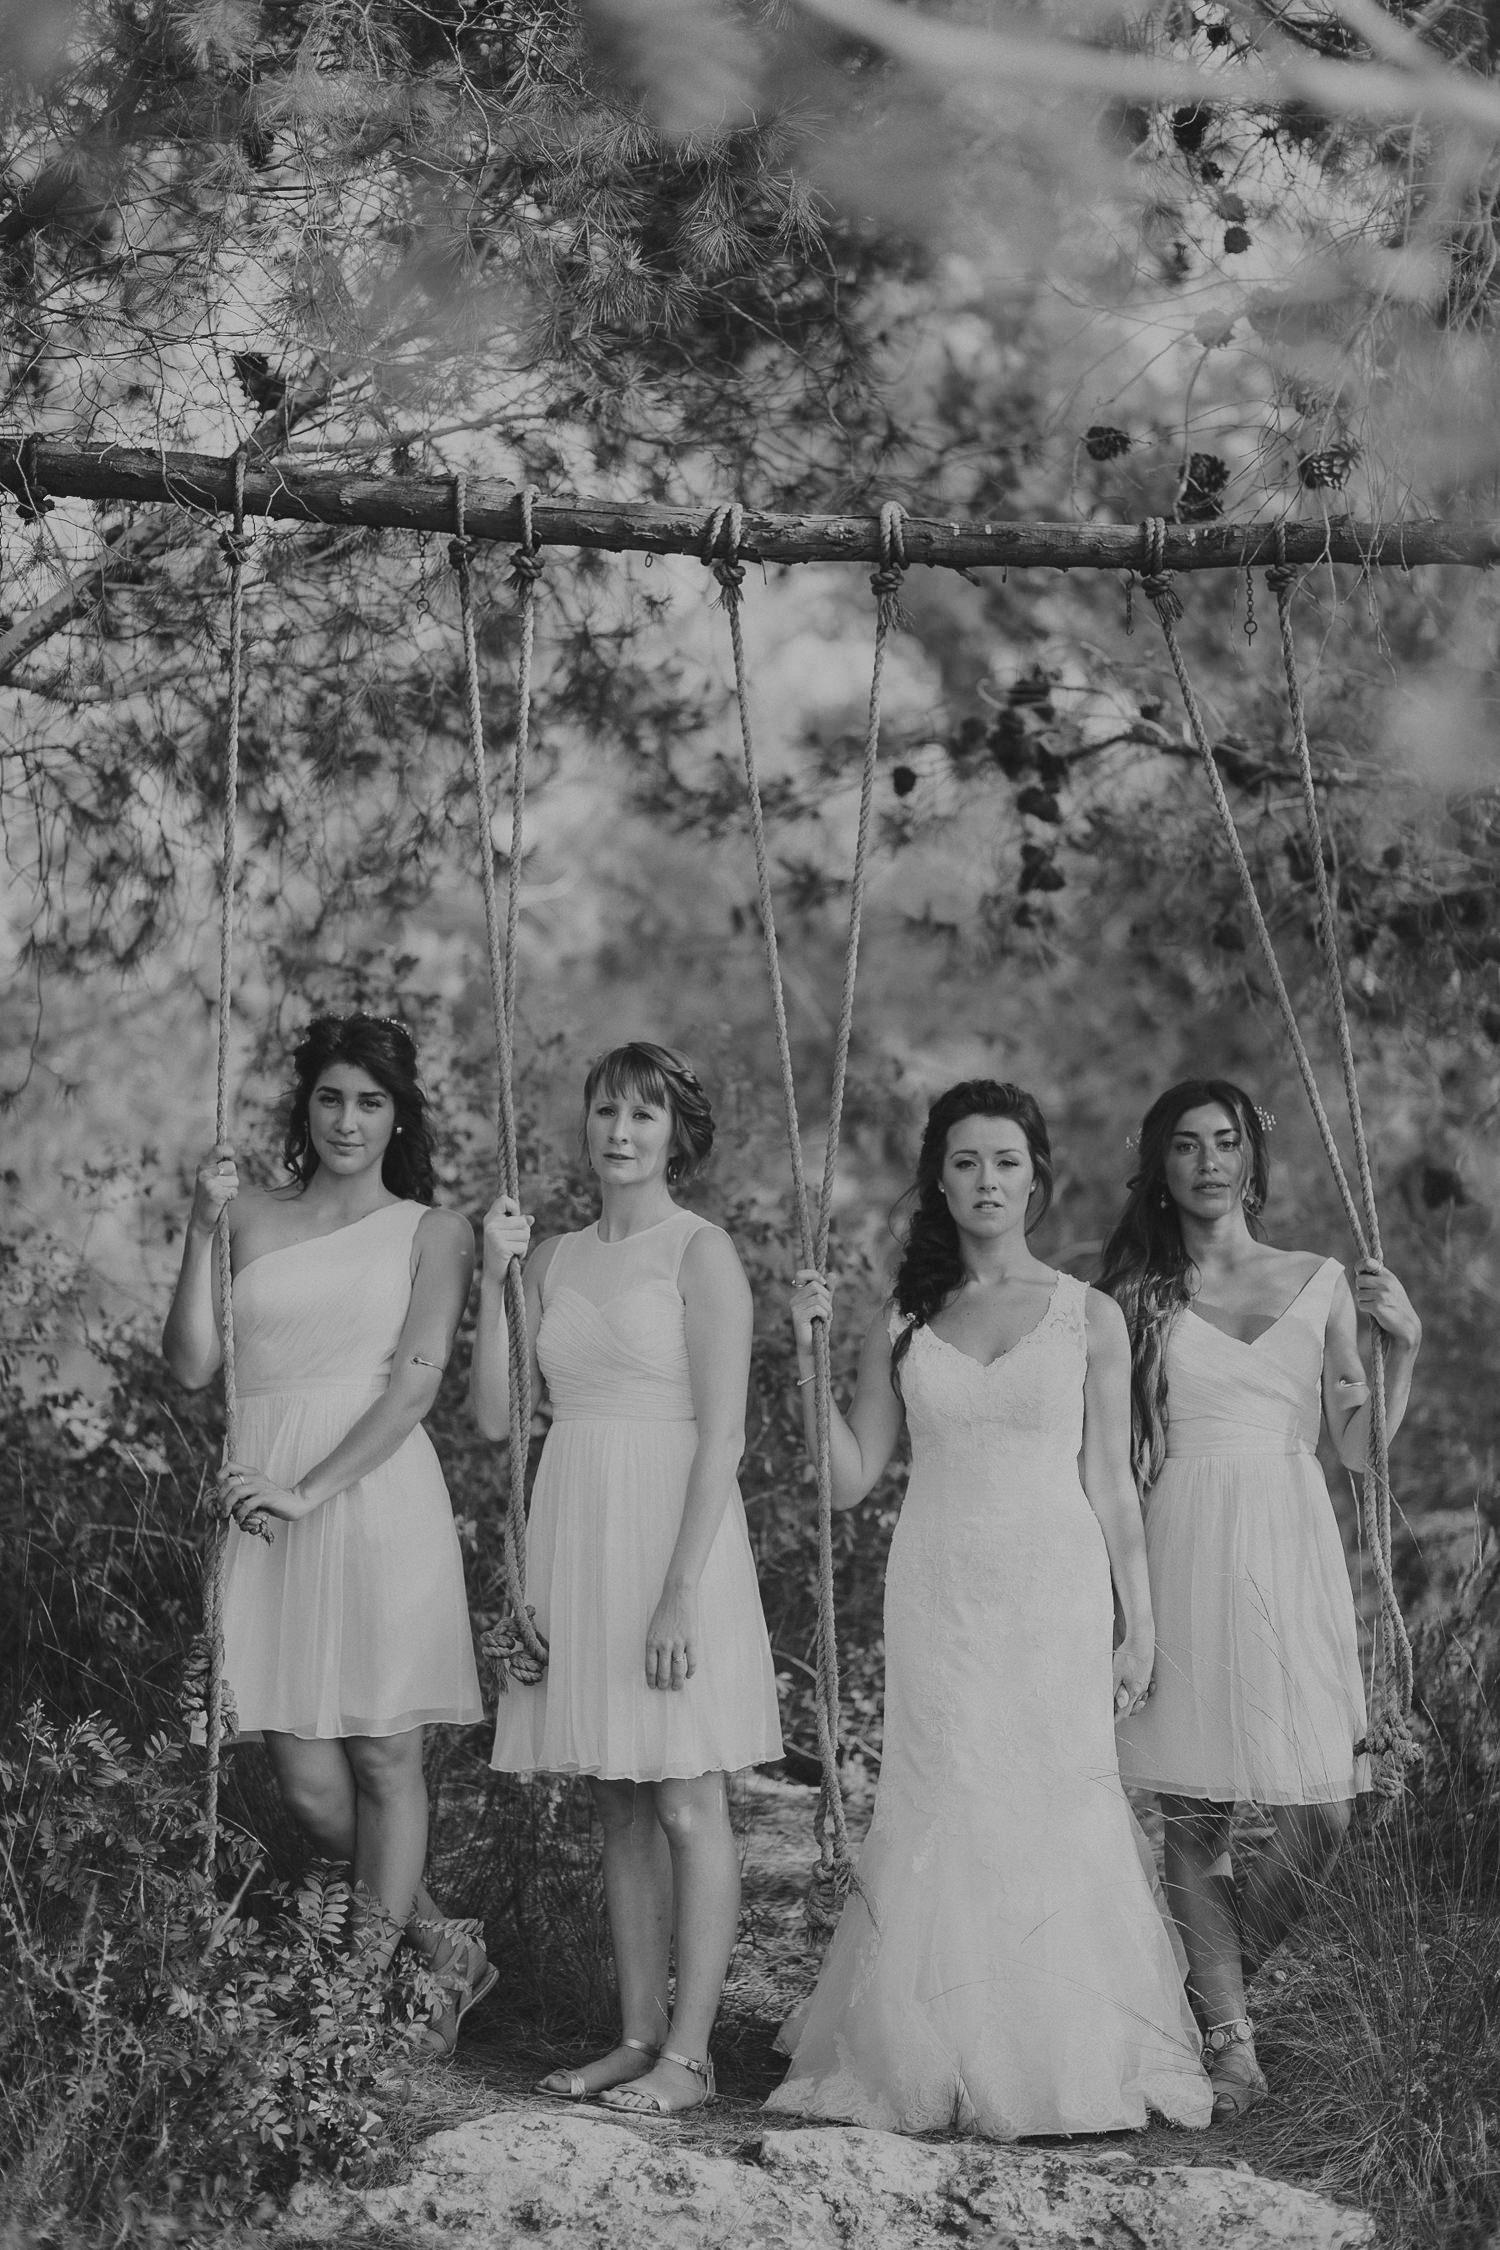 Countryside Wedding - Liron Erel - Echoes & Wildhearts 0058.jpg